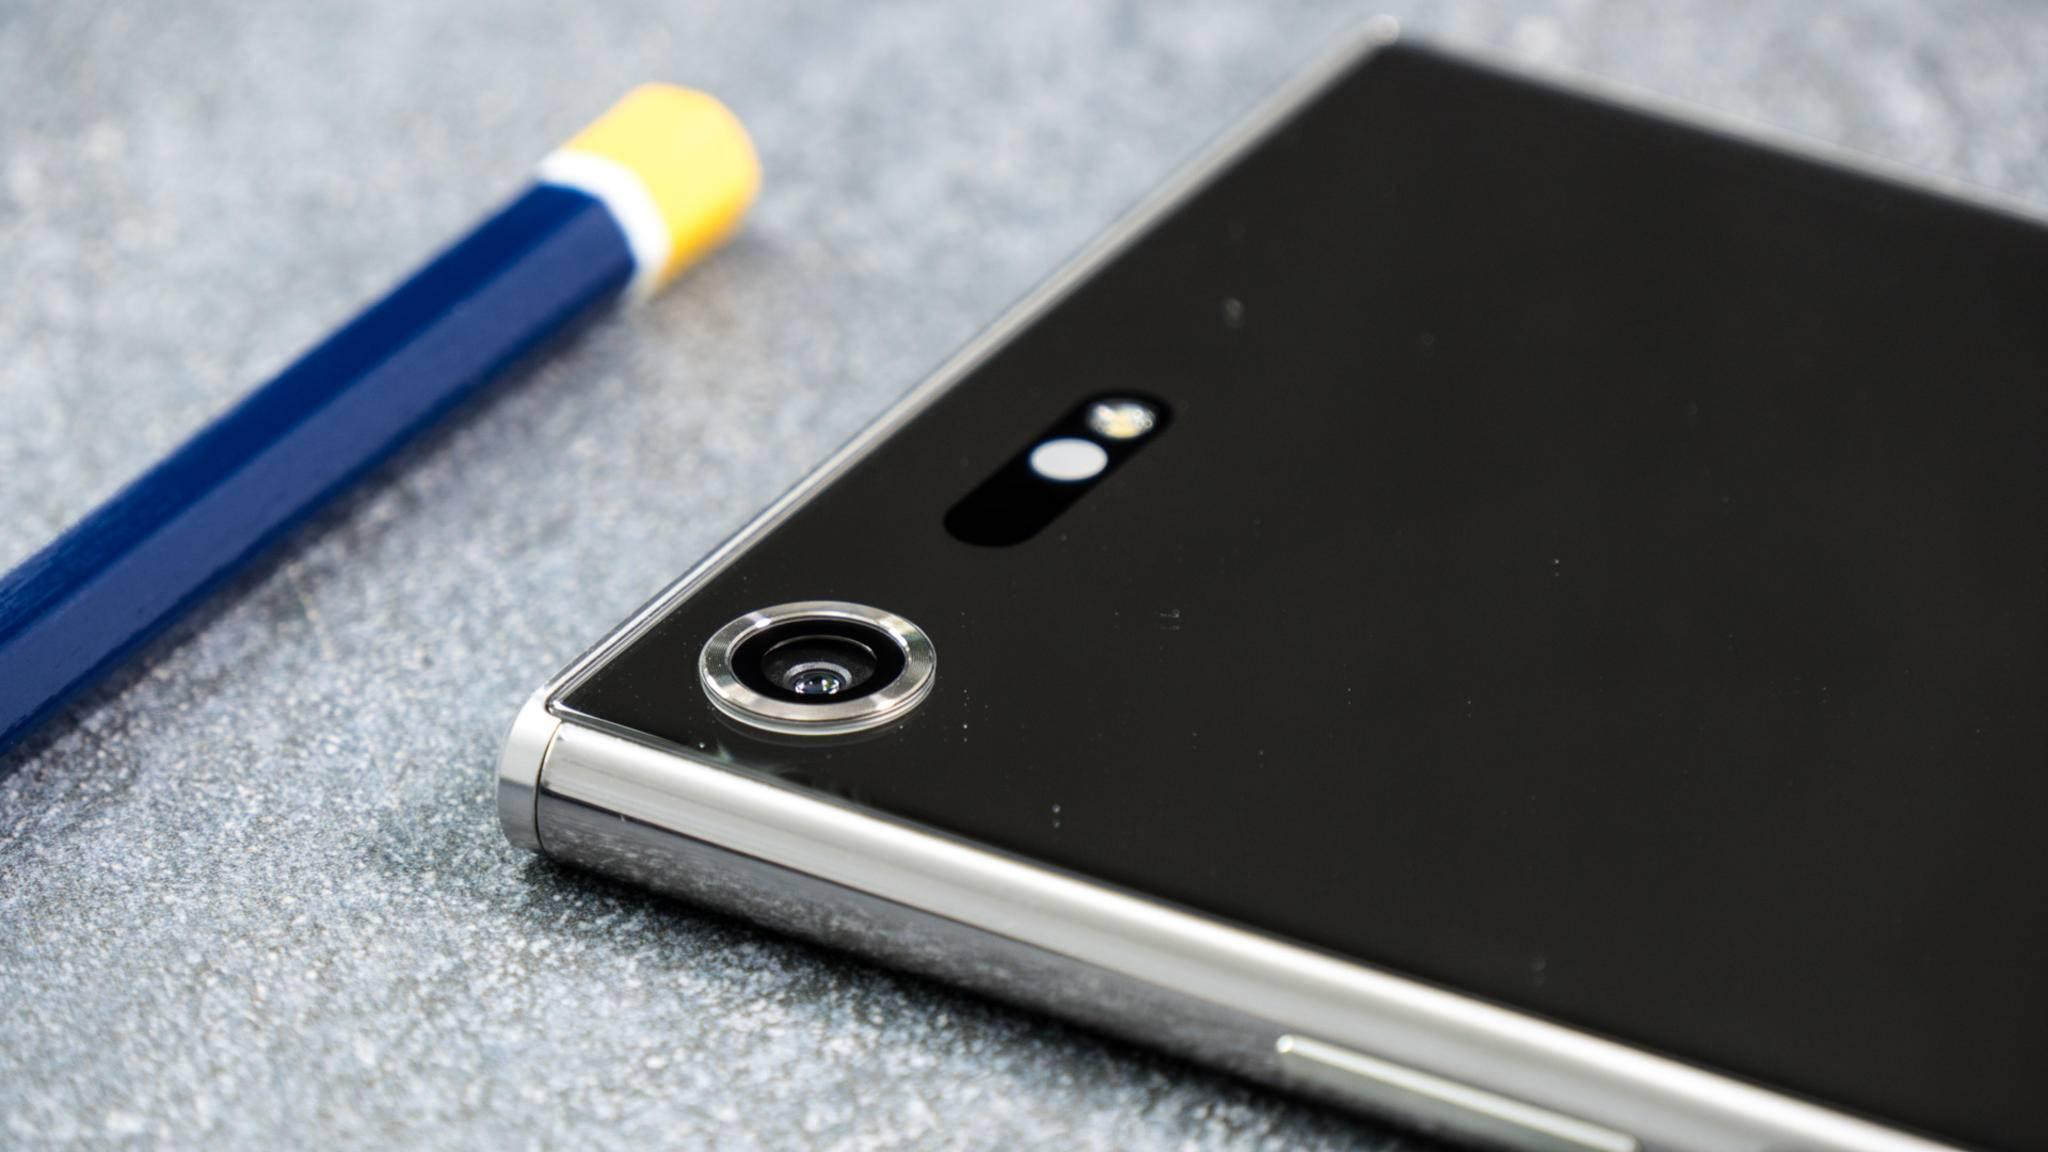 Das Sony Xperia XZ Premium kann in Super-Zeitlupe filmen.